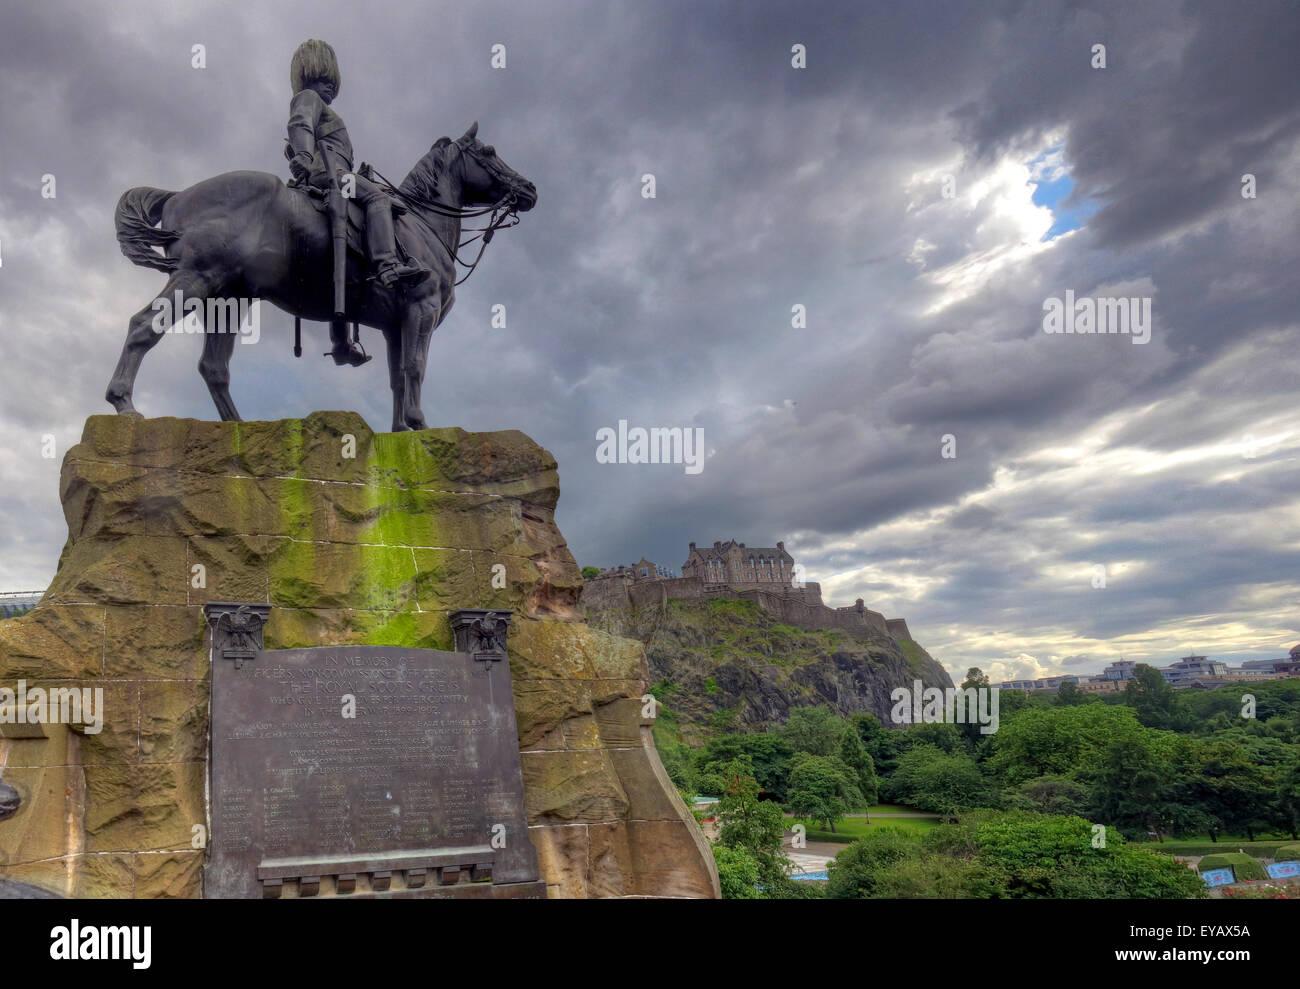 Statue/Plaque in memory of the Royal Scots Greys, Princes St, Edinburgh, Scotland, UK Stock Photo